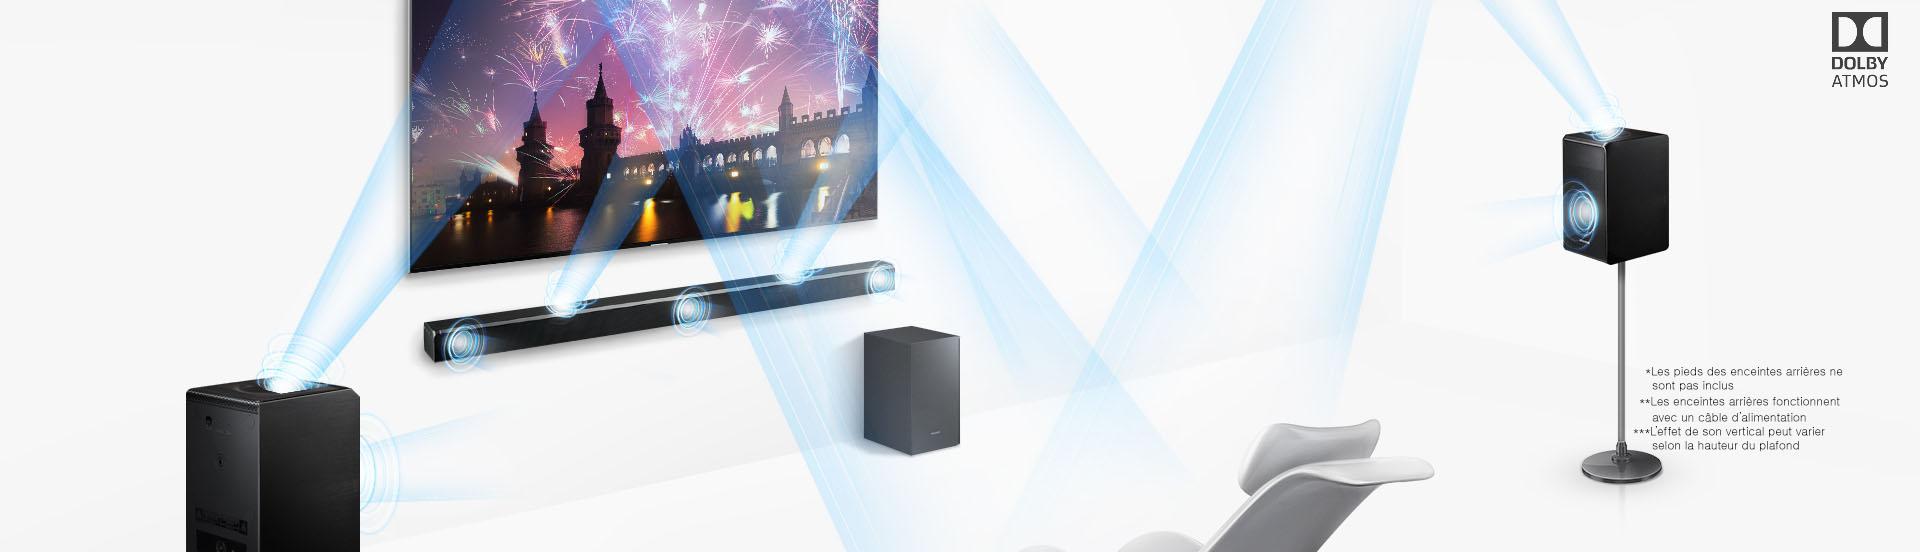 Barre de son Samsung HW-K950 : Technologie Dolby Atmos 5.1.4